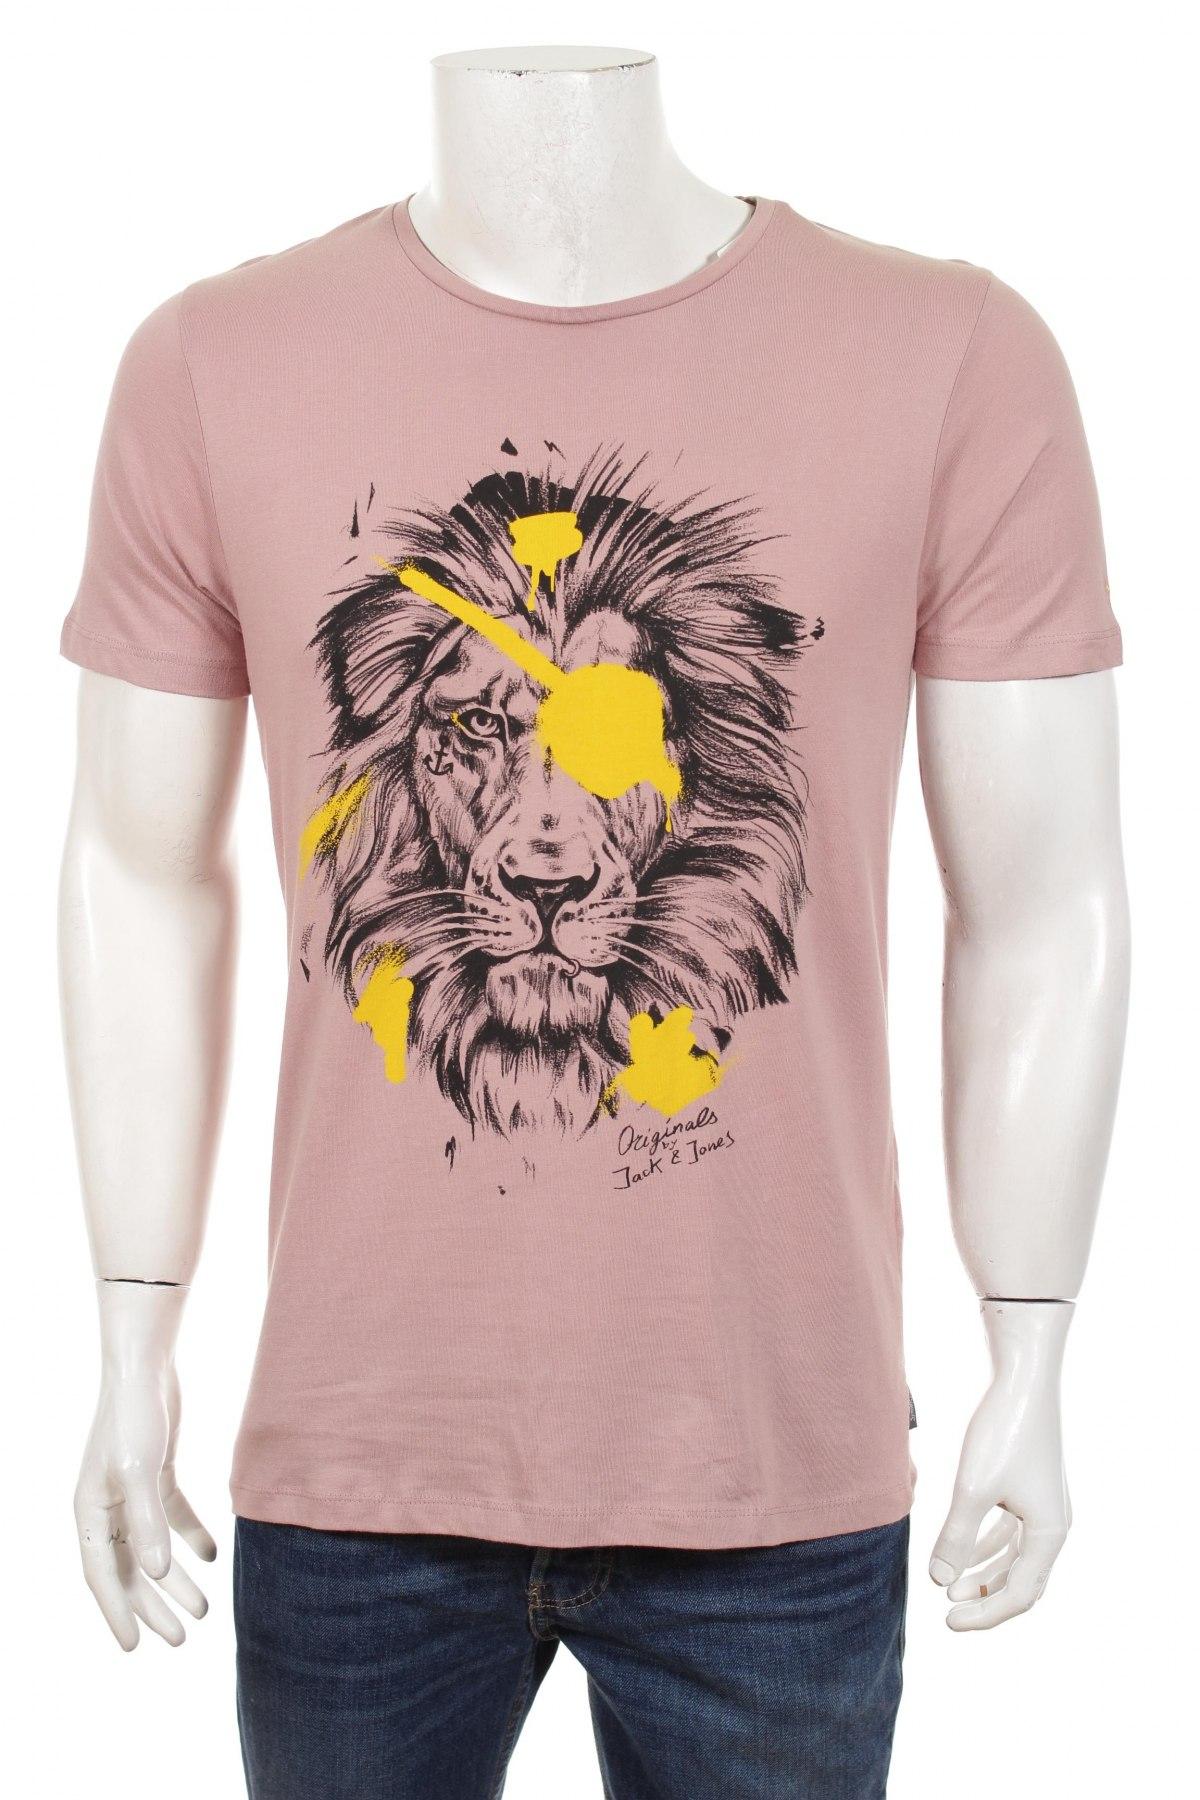 2bc6b9a15 Pánske tričko Jack & Jones - za výhodnú cenu na Remix - #101814549